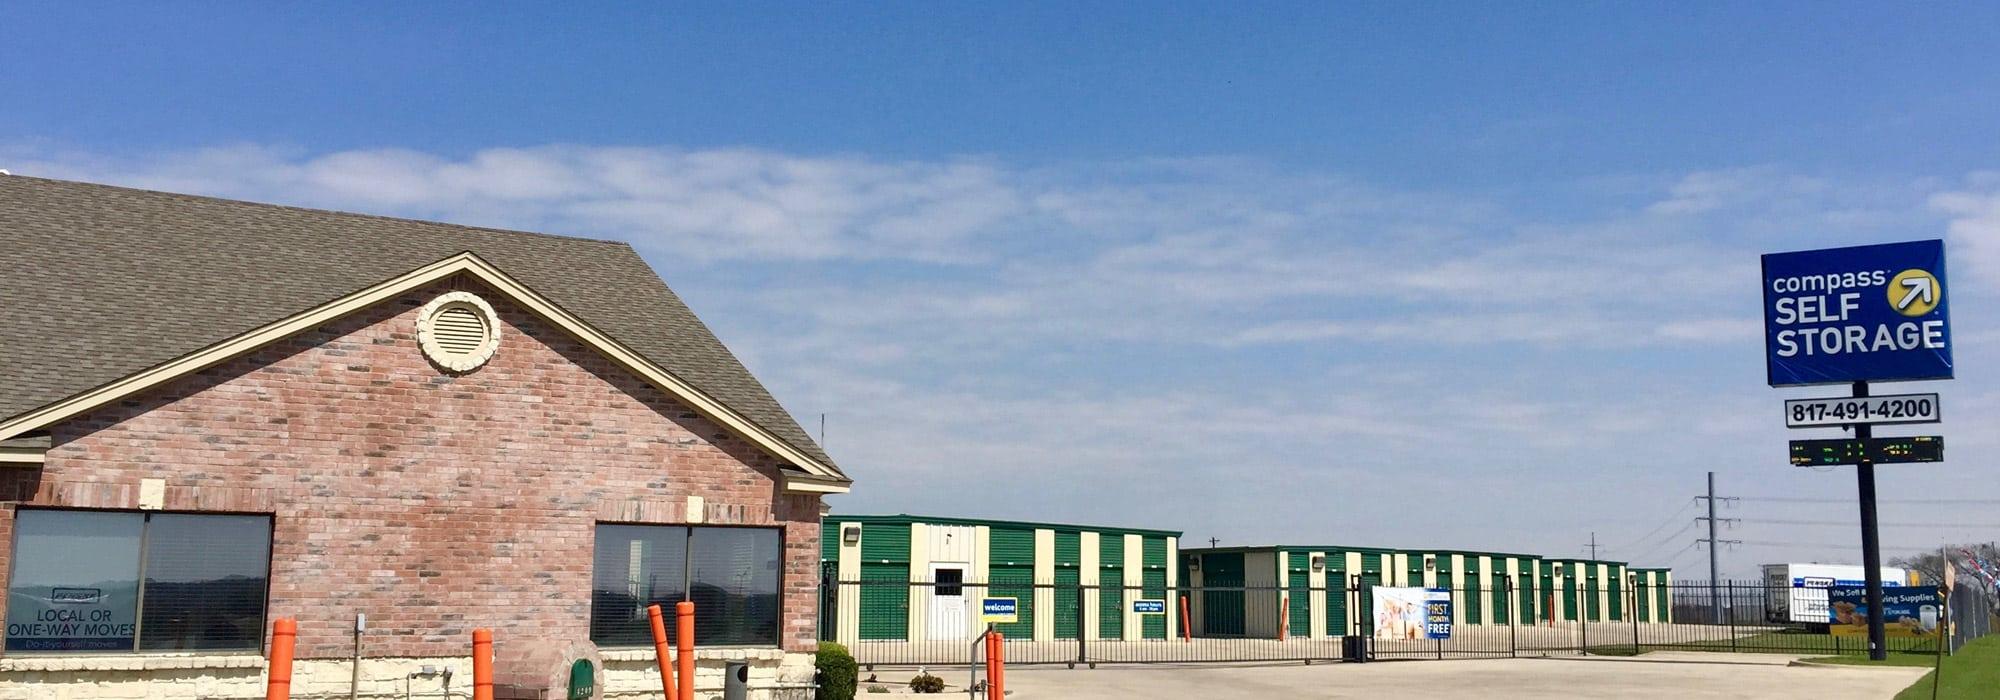 Self storage in Ft. Worth TX